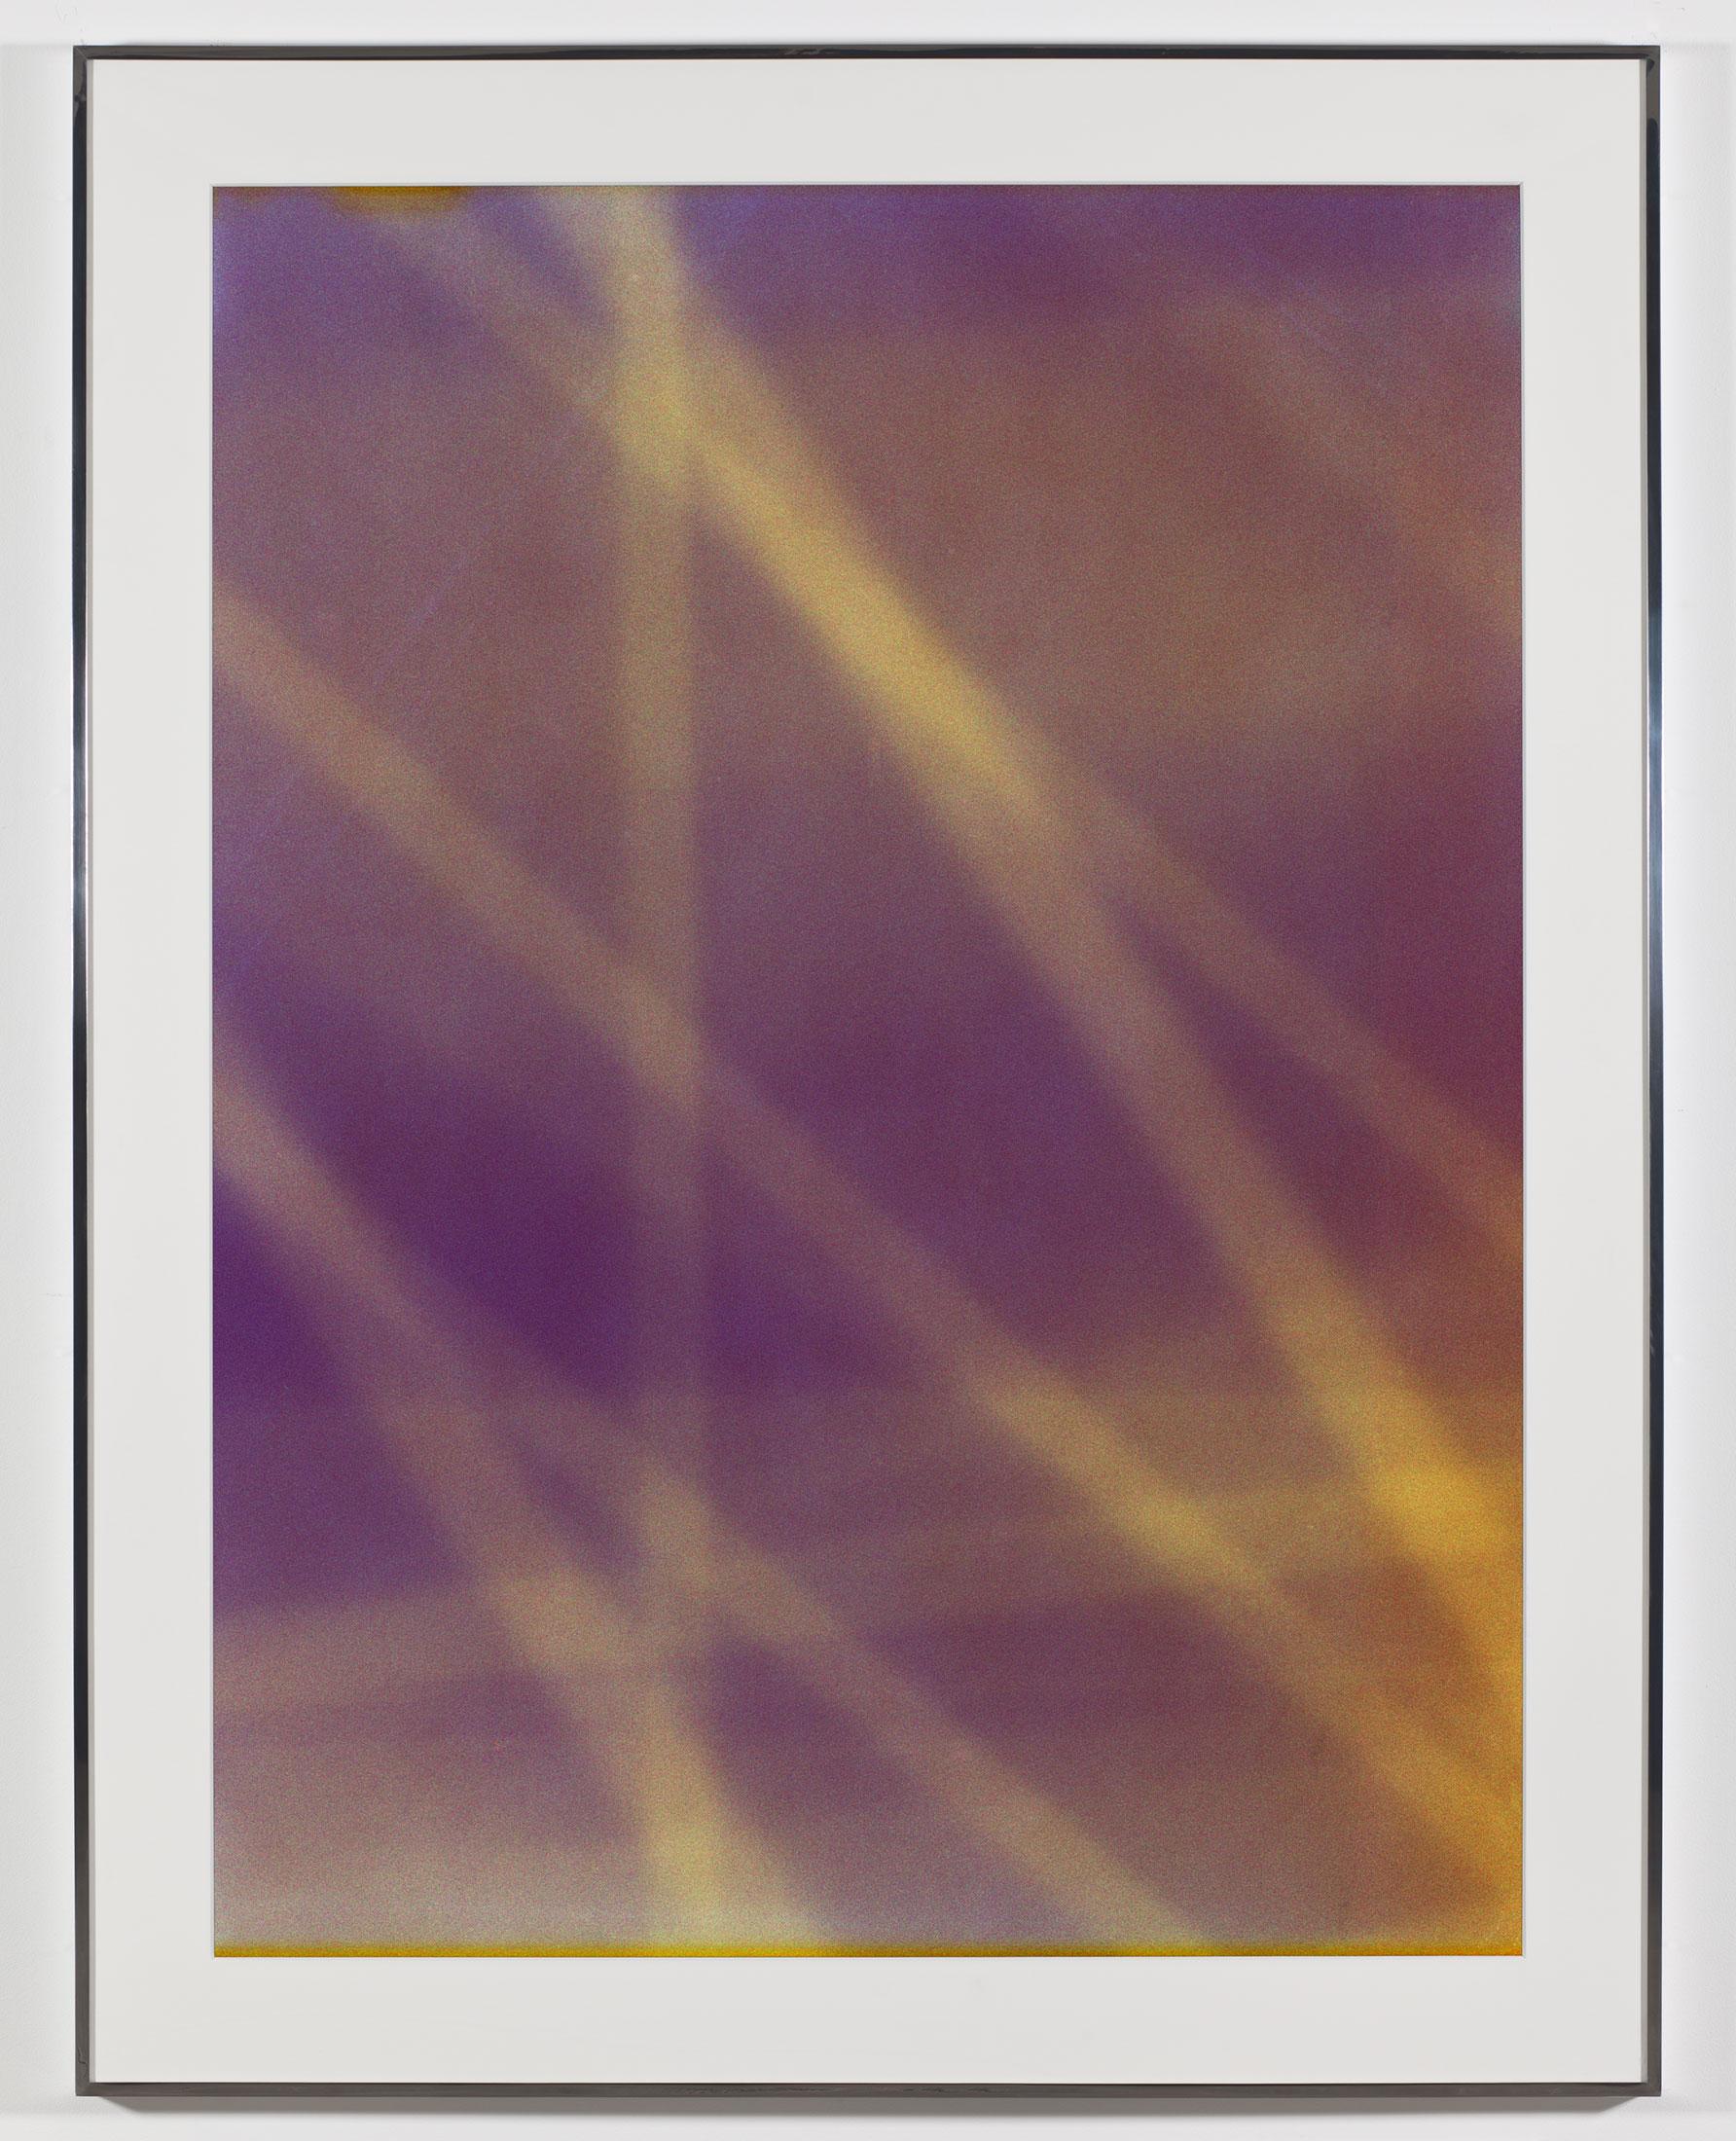 Transparency (Negative) [Kodak Portra 400NC Em. No. 51341: May 8–May 18, 2008 ORD/LHR LHR/IAD IAD/JFK LGA/DCA DCA/ORD]   2009  Epson Ultrachrome K3 archival ink jet print on Museo Silver Rag Paper  68 x 52 1/4 inches   Transparencies, 2008–2014    Altermodern, 2009